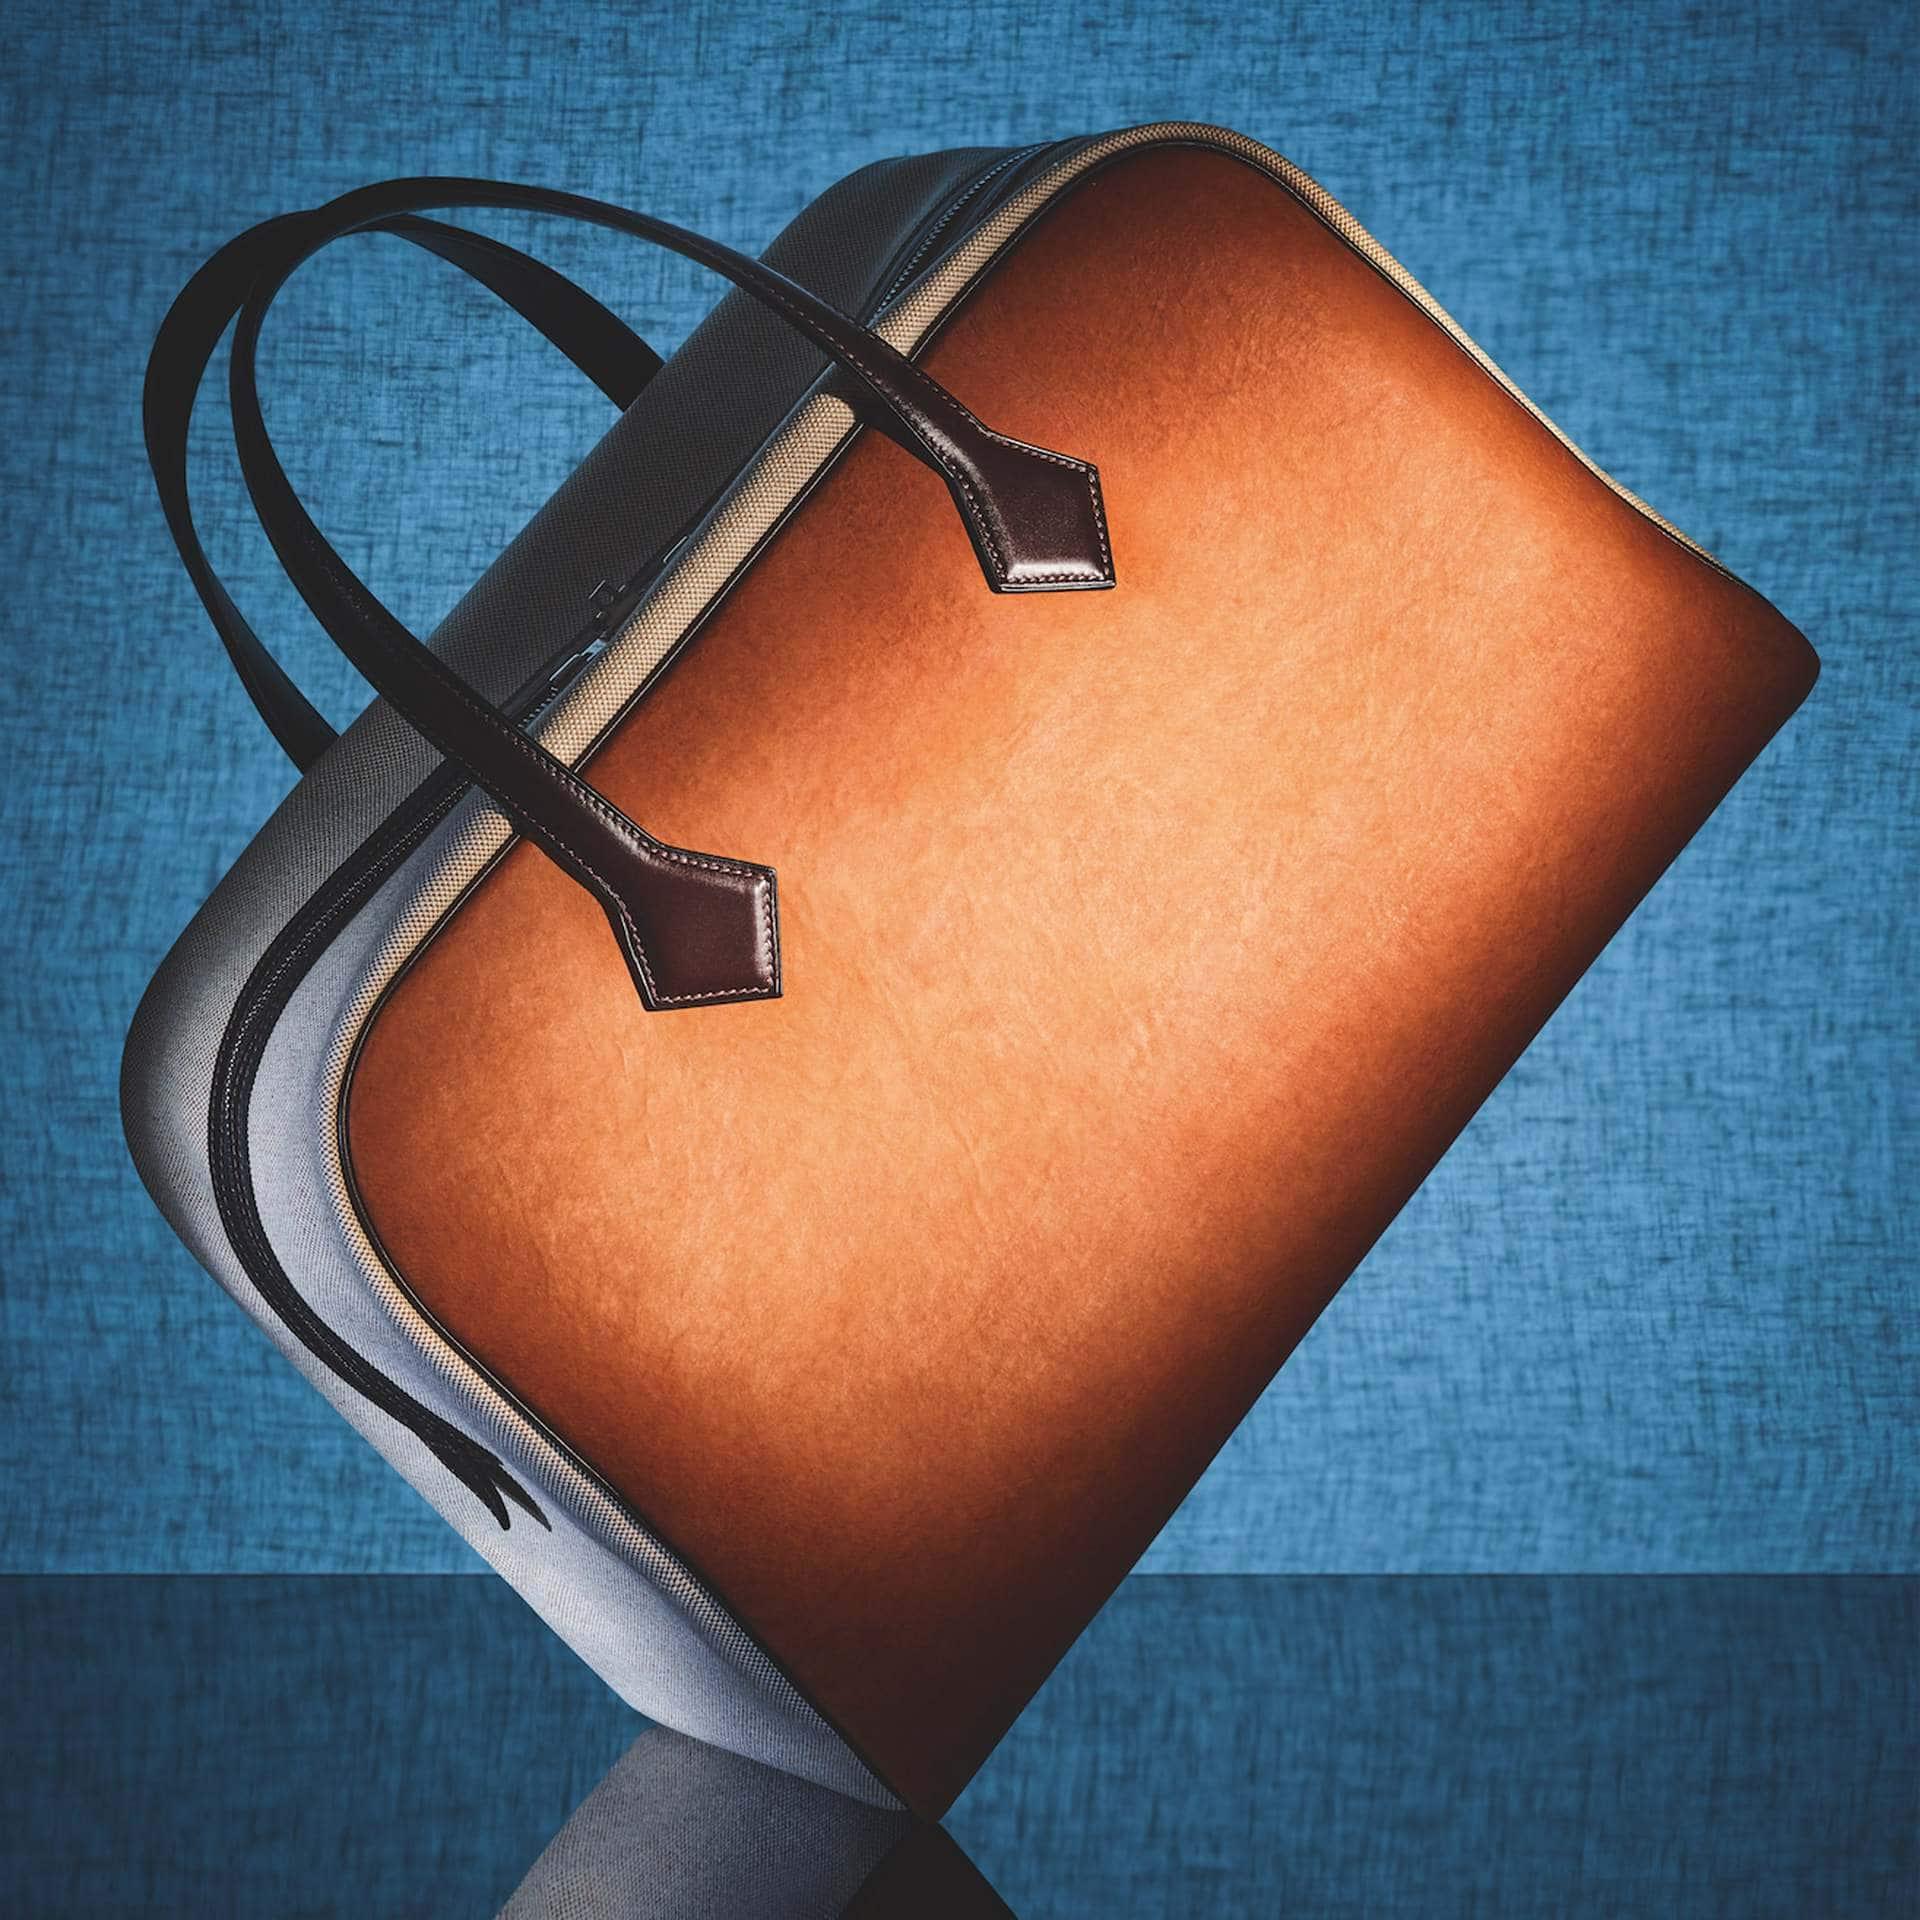 hermes mycoworks leather bag